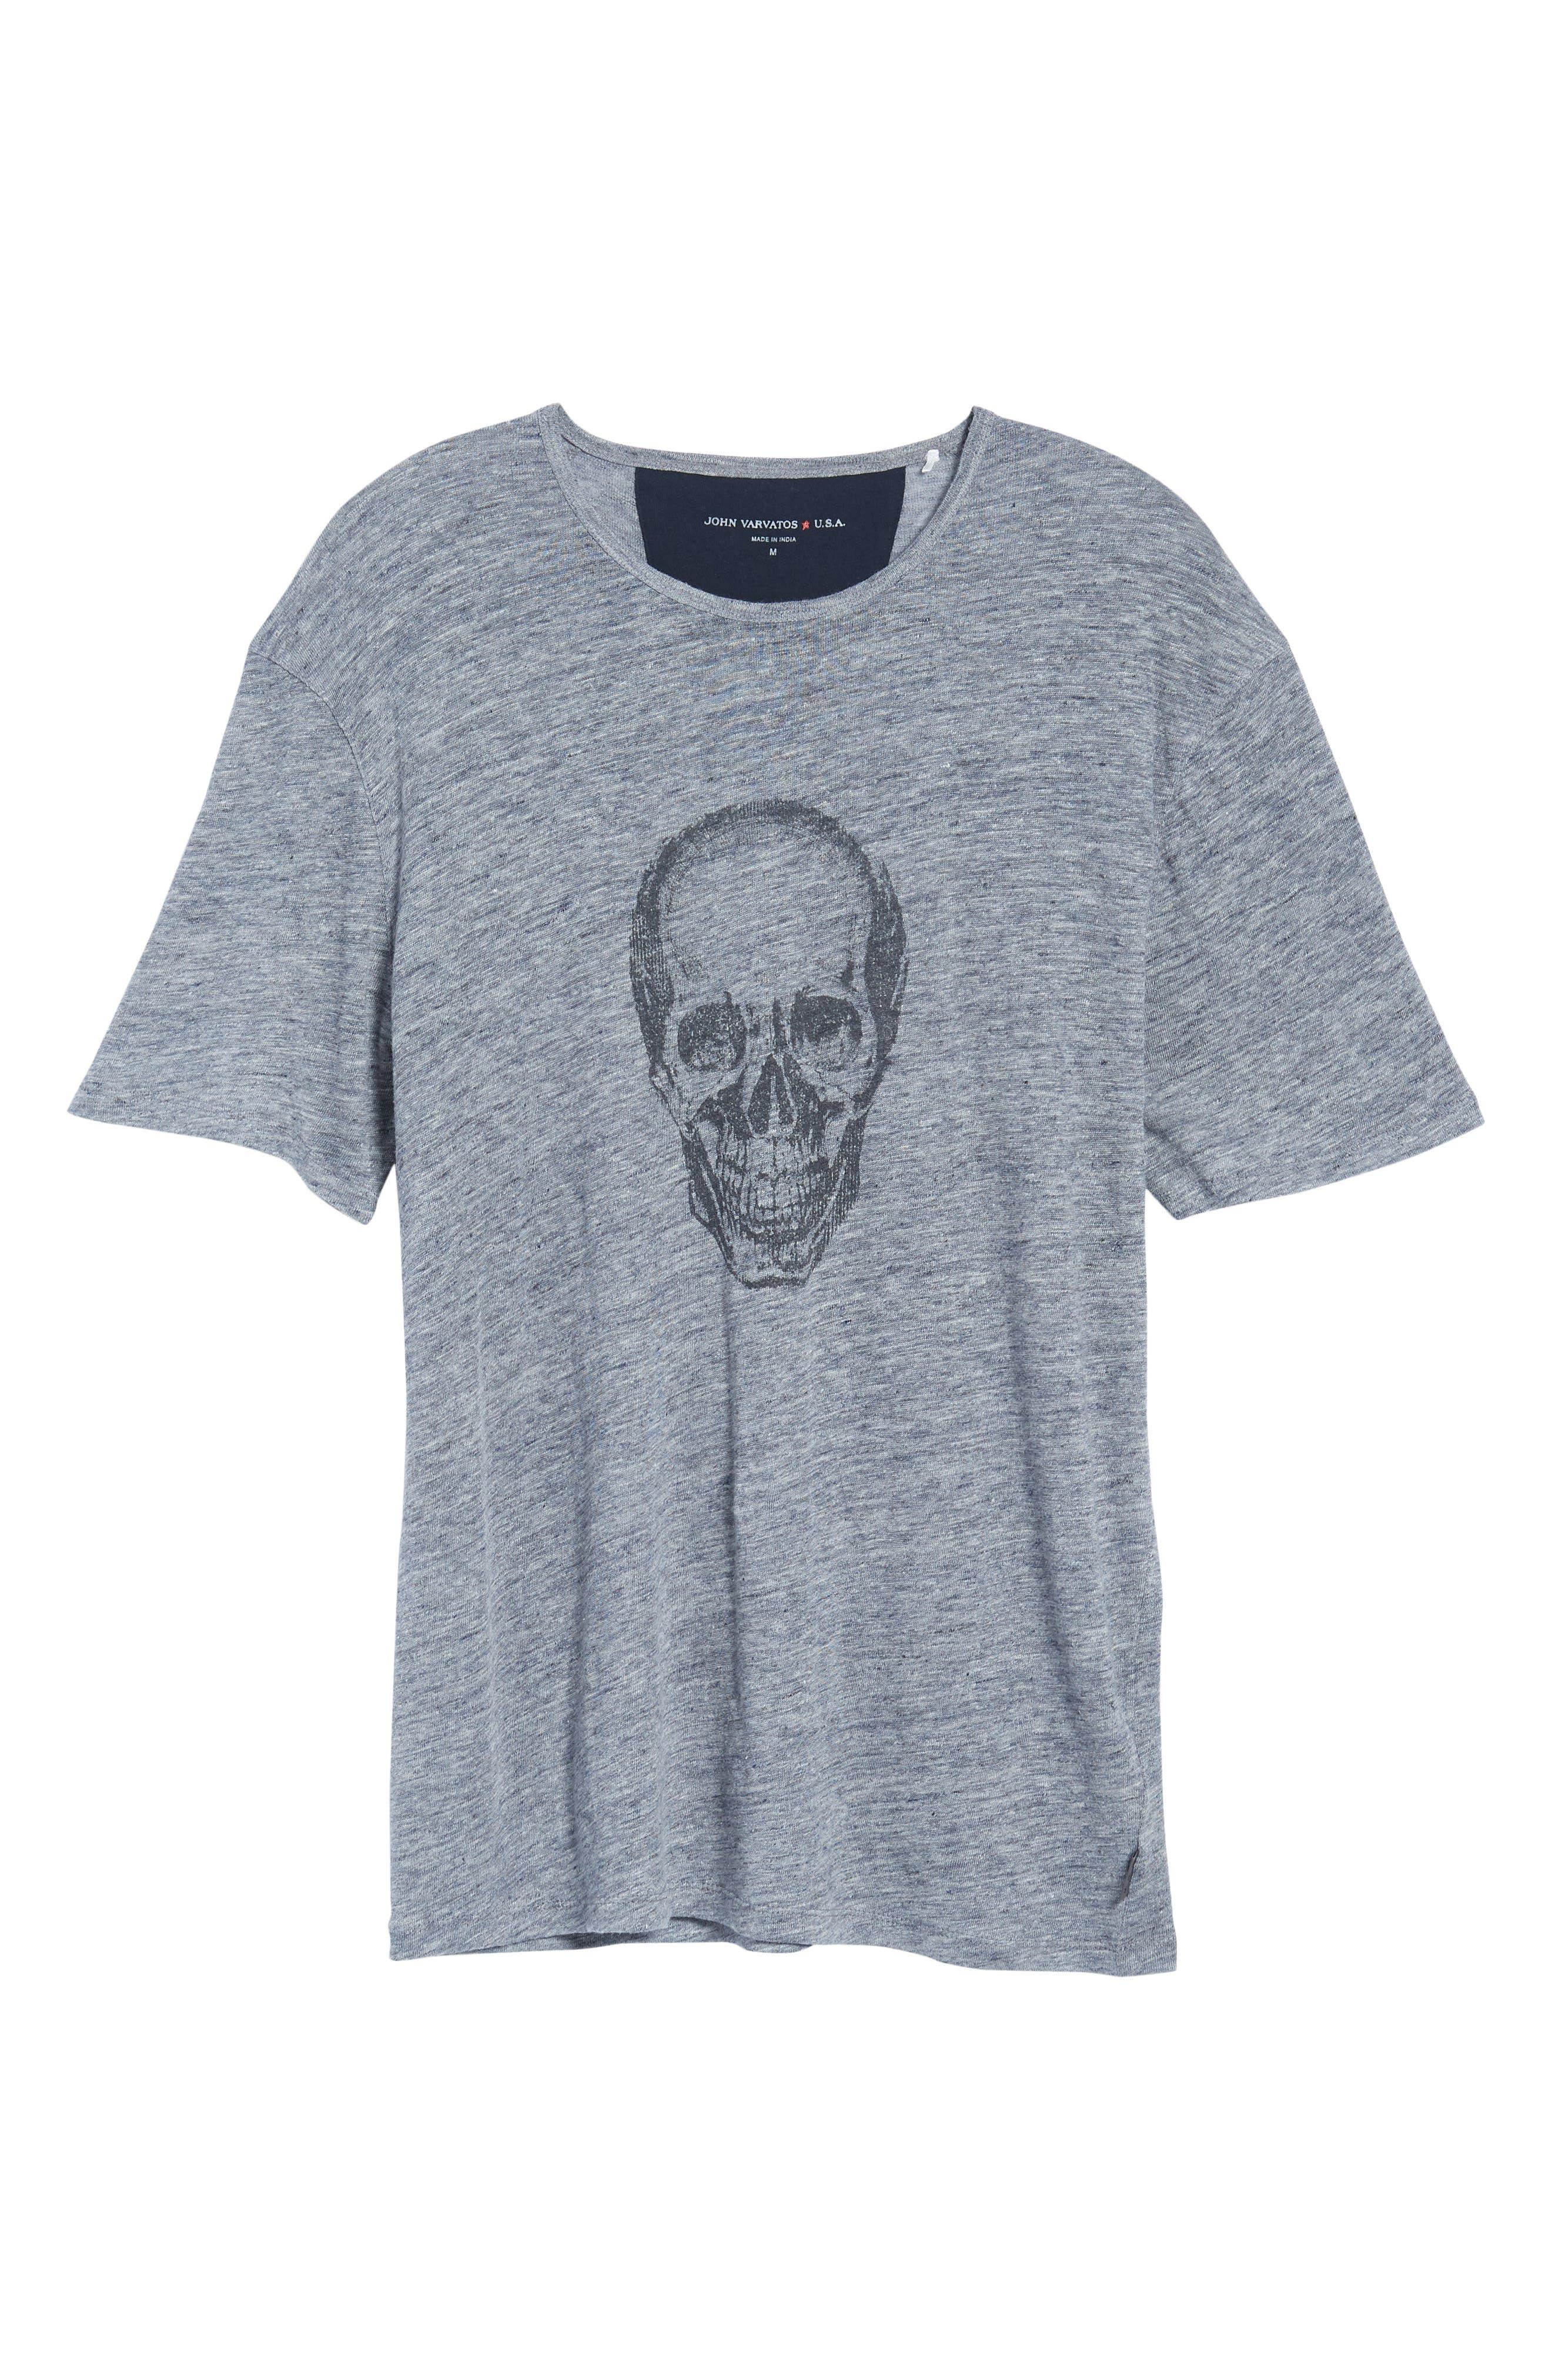 John Varvatos Crewneck Linen T-Shirt,                             Alternate thumbnail 6, color,                             Med Grey